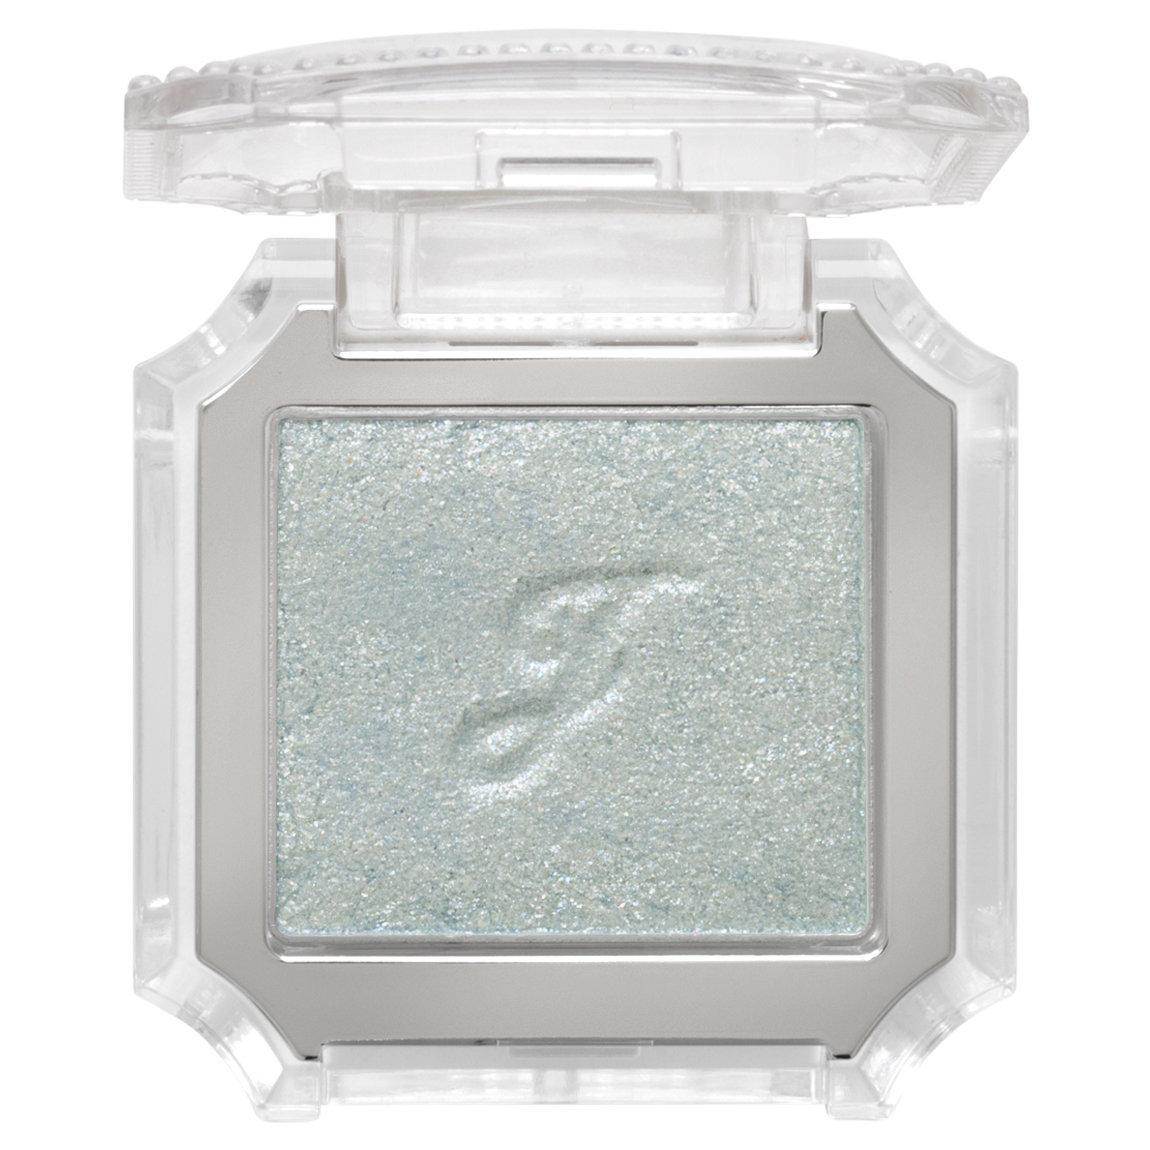 JILL STUART Beauty Iconic Look Eyeshadow G302 Glitter alternative view 1 - product swatch.